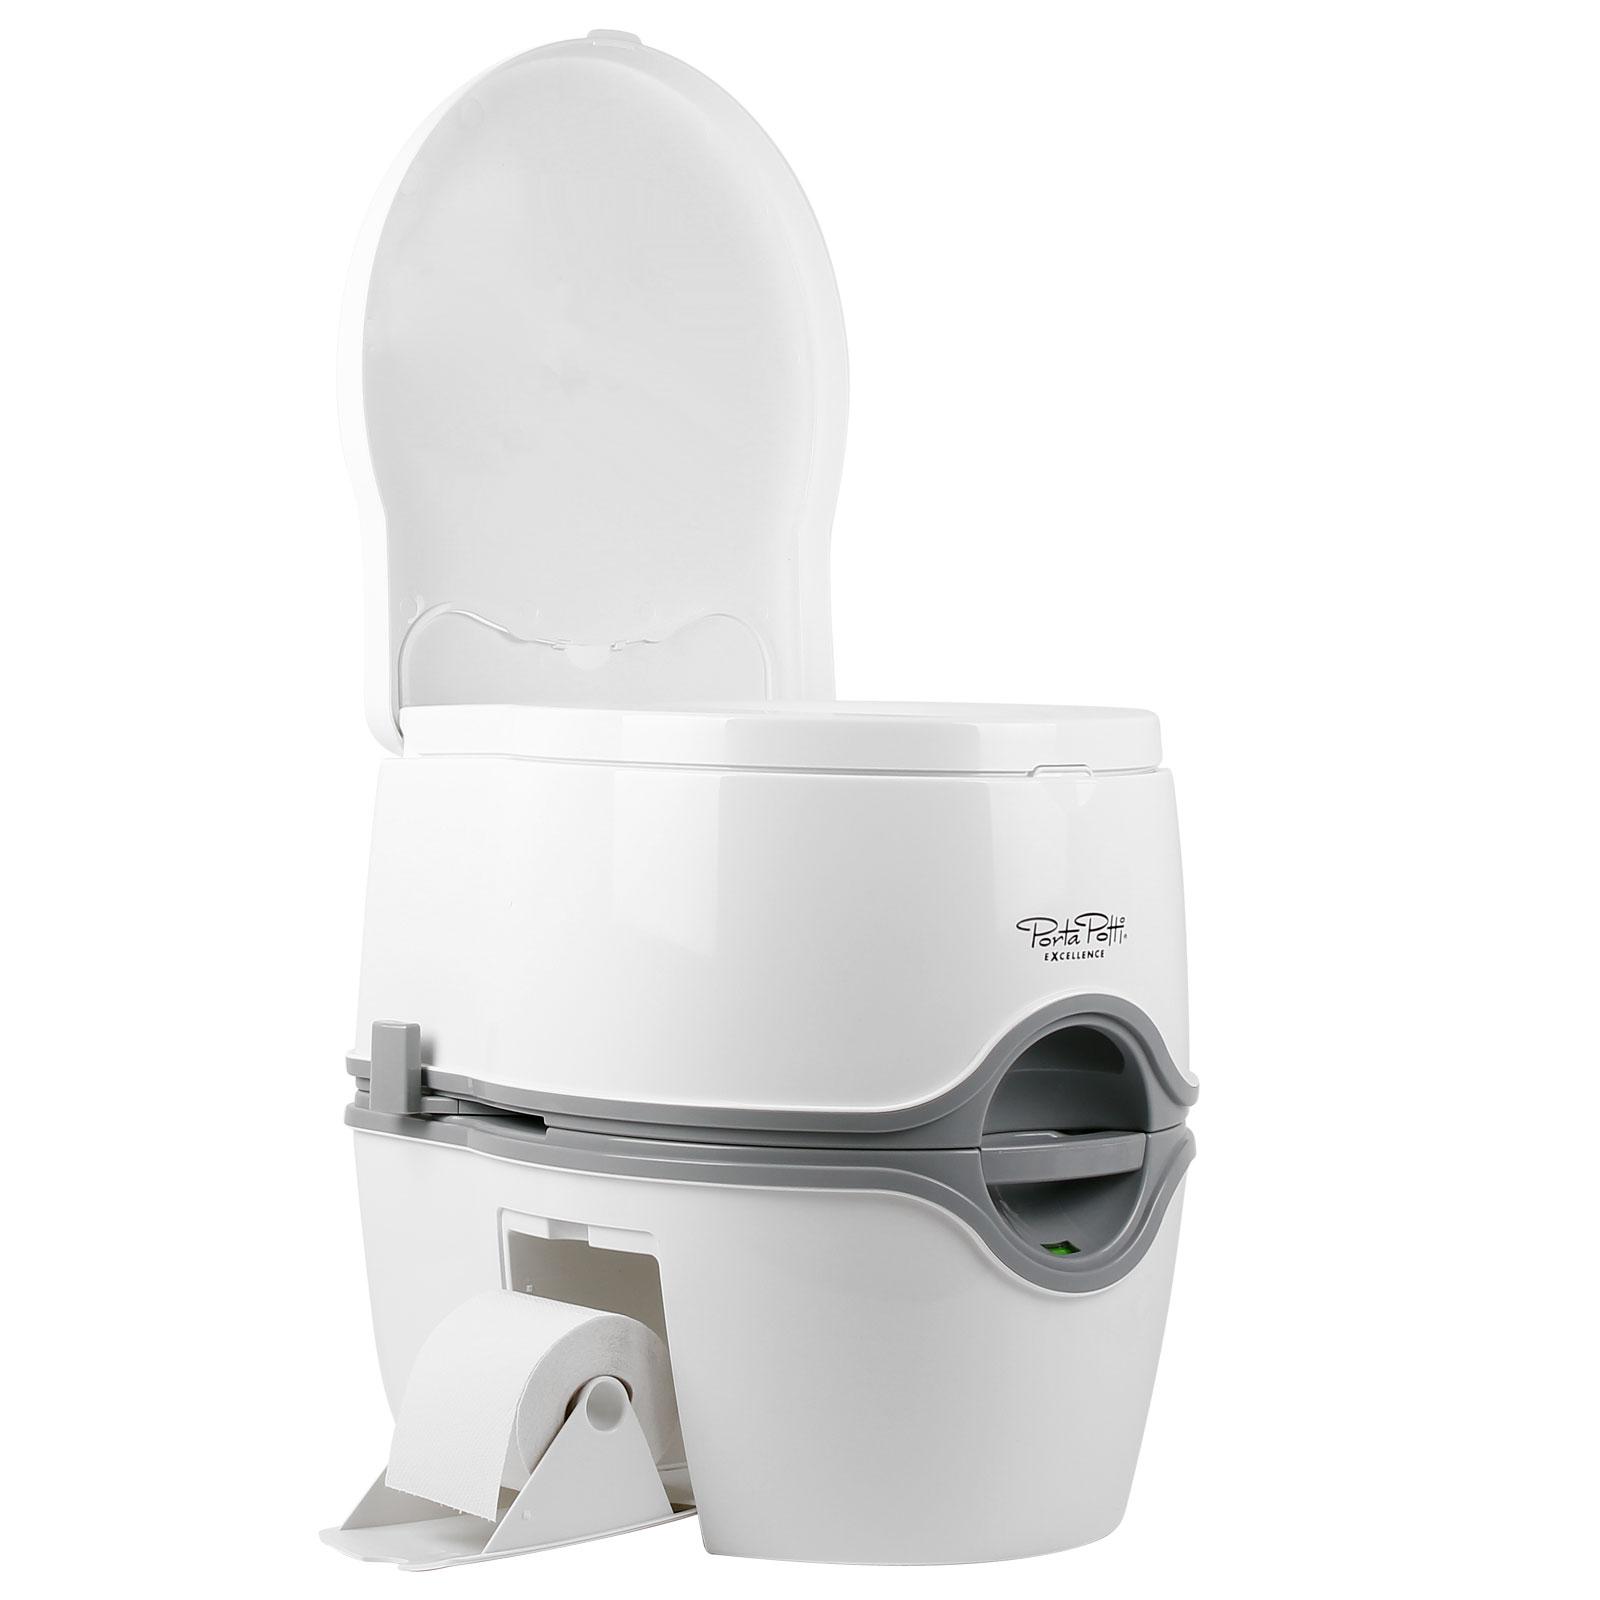 porta potti excellence campingtoilette aquasoft. Black Bedroom Furniture Sets. Home Design Ideas